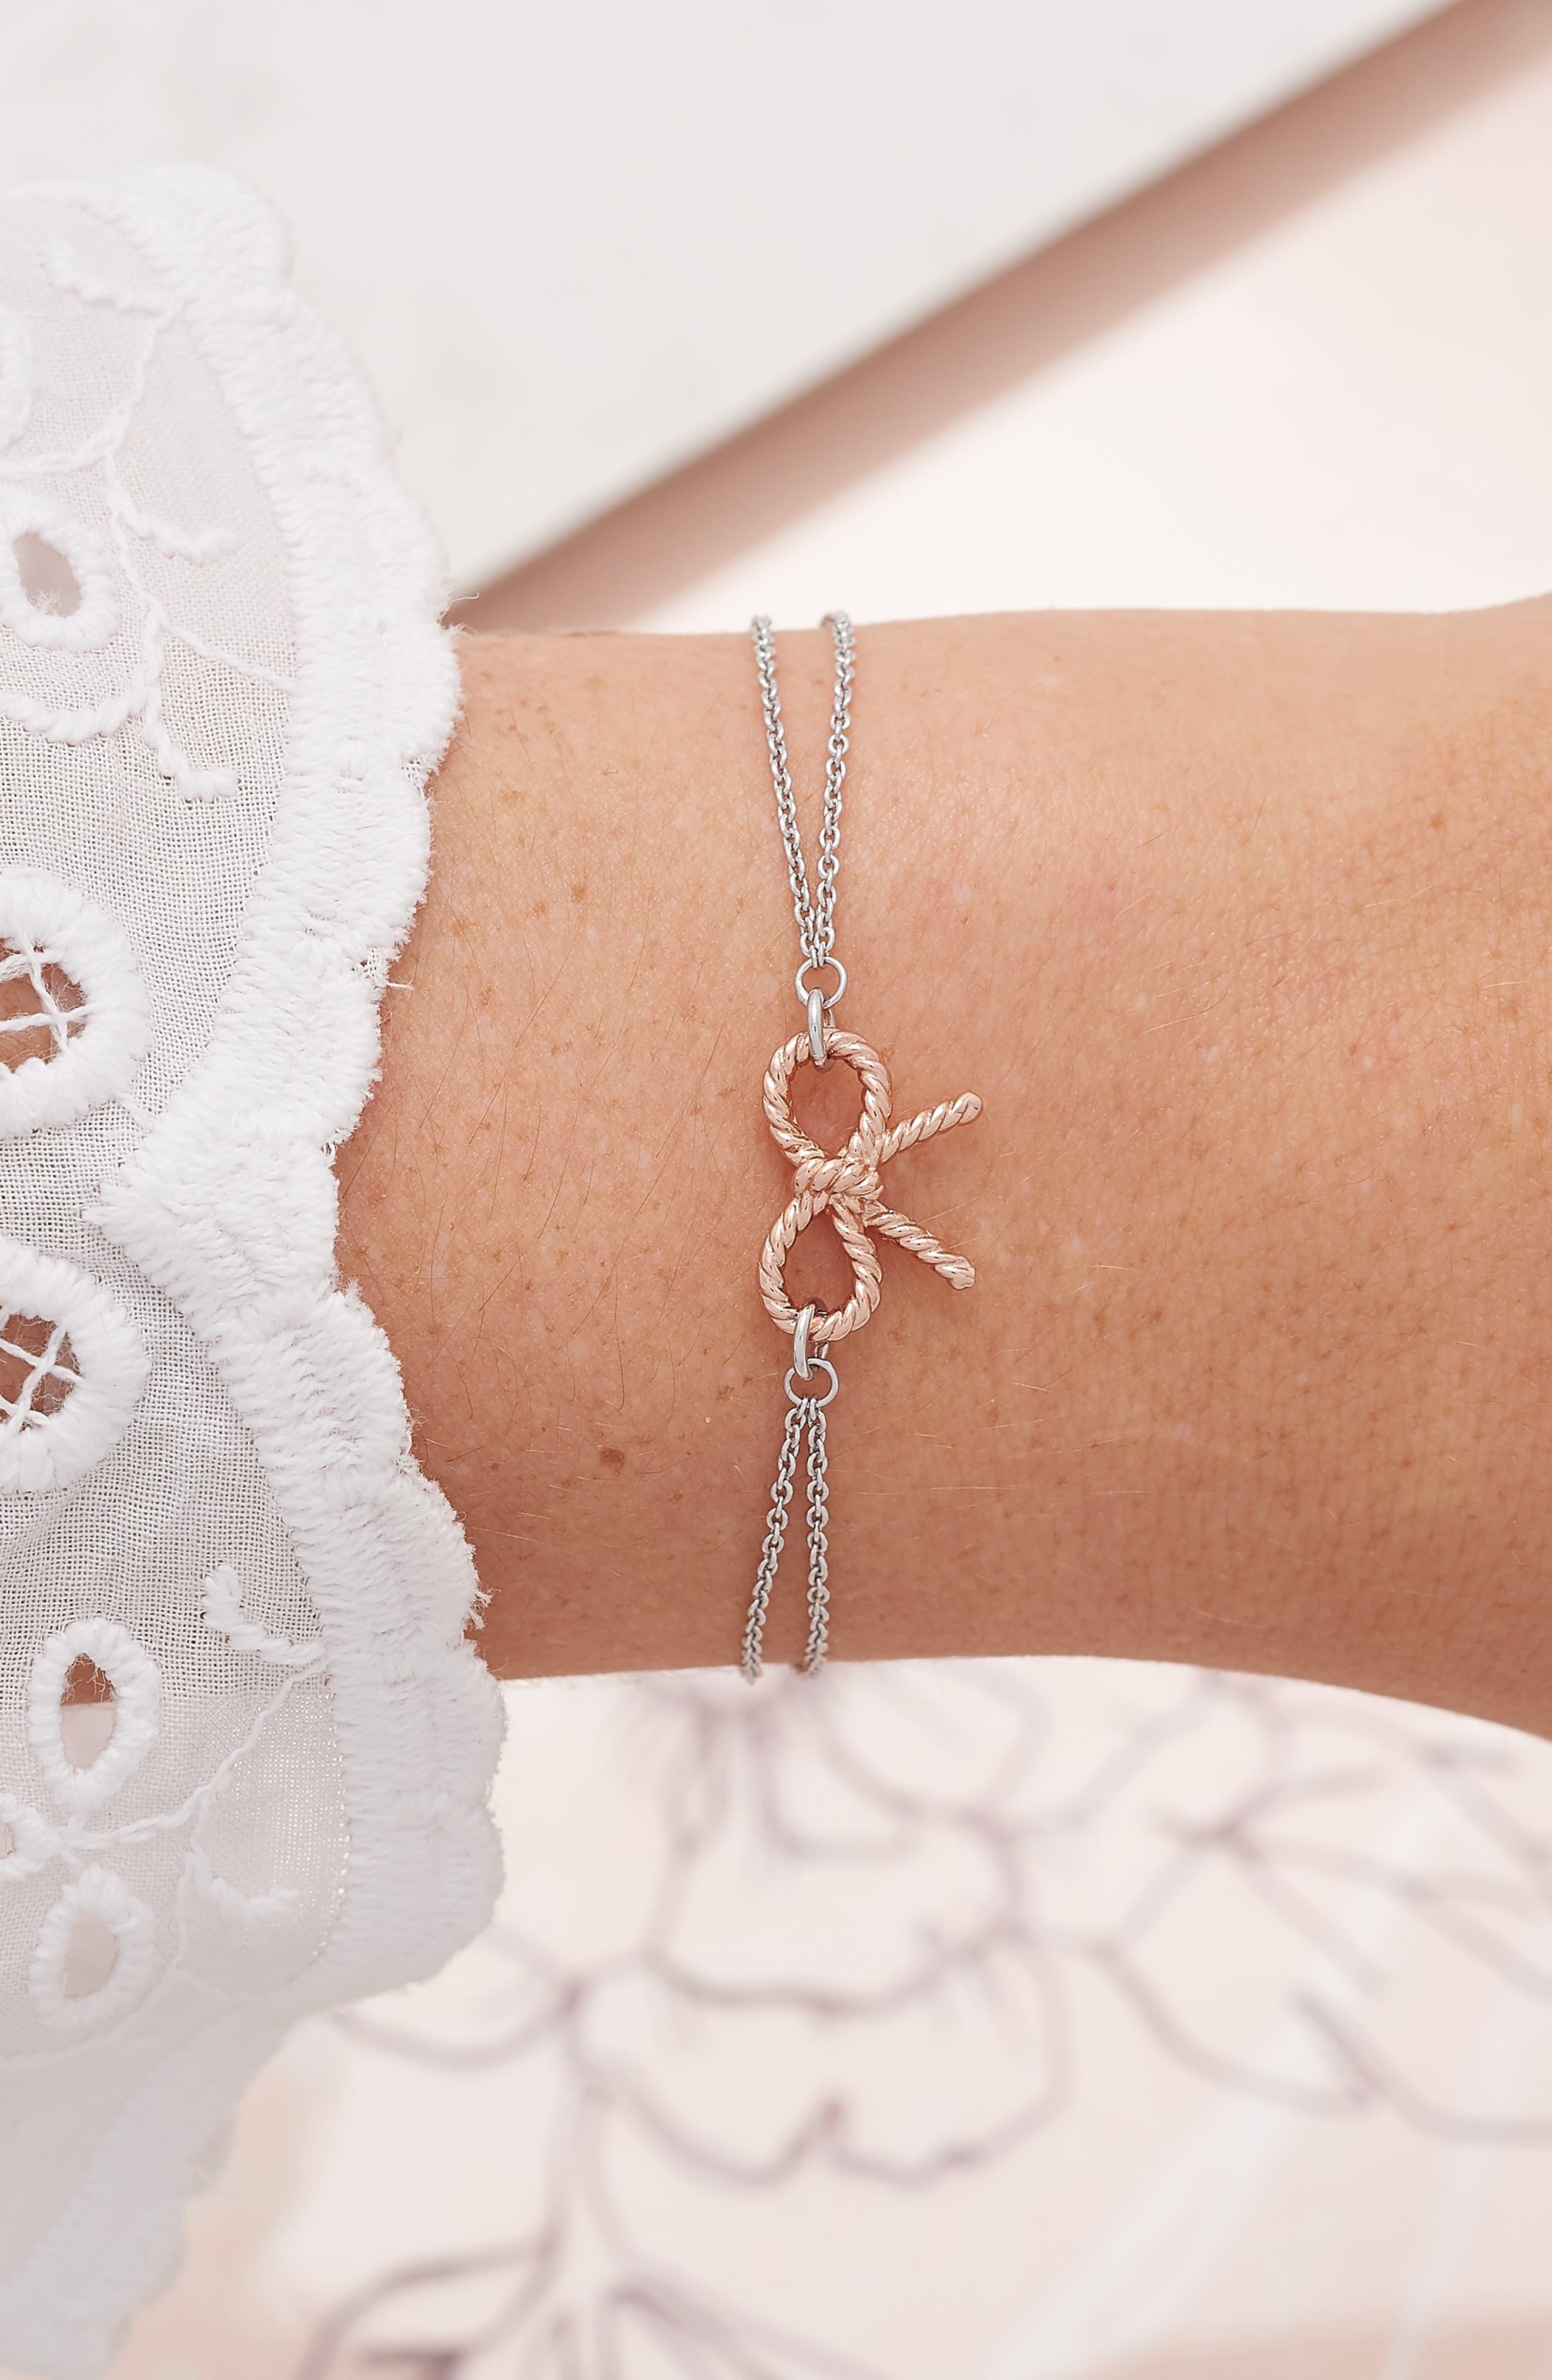 Vintage Bow Chain Bracelet,                             Alternate thumbnail 2, color,                             SILVER/ ROSE GOLD